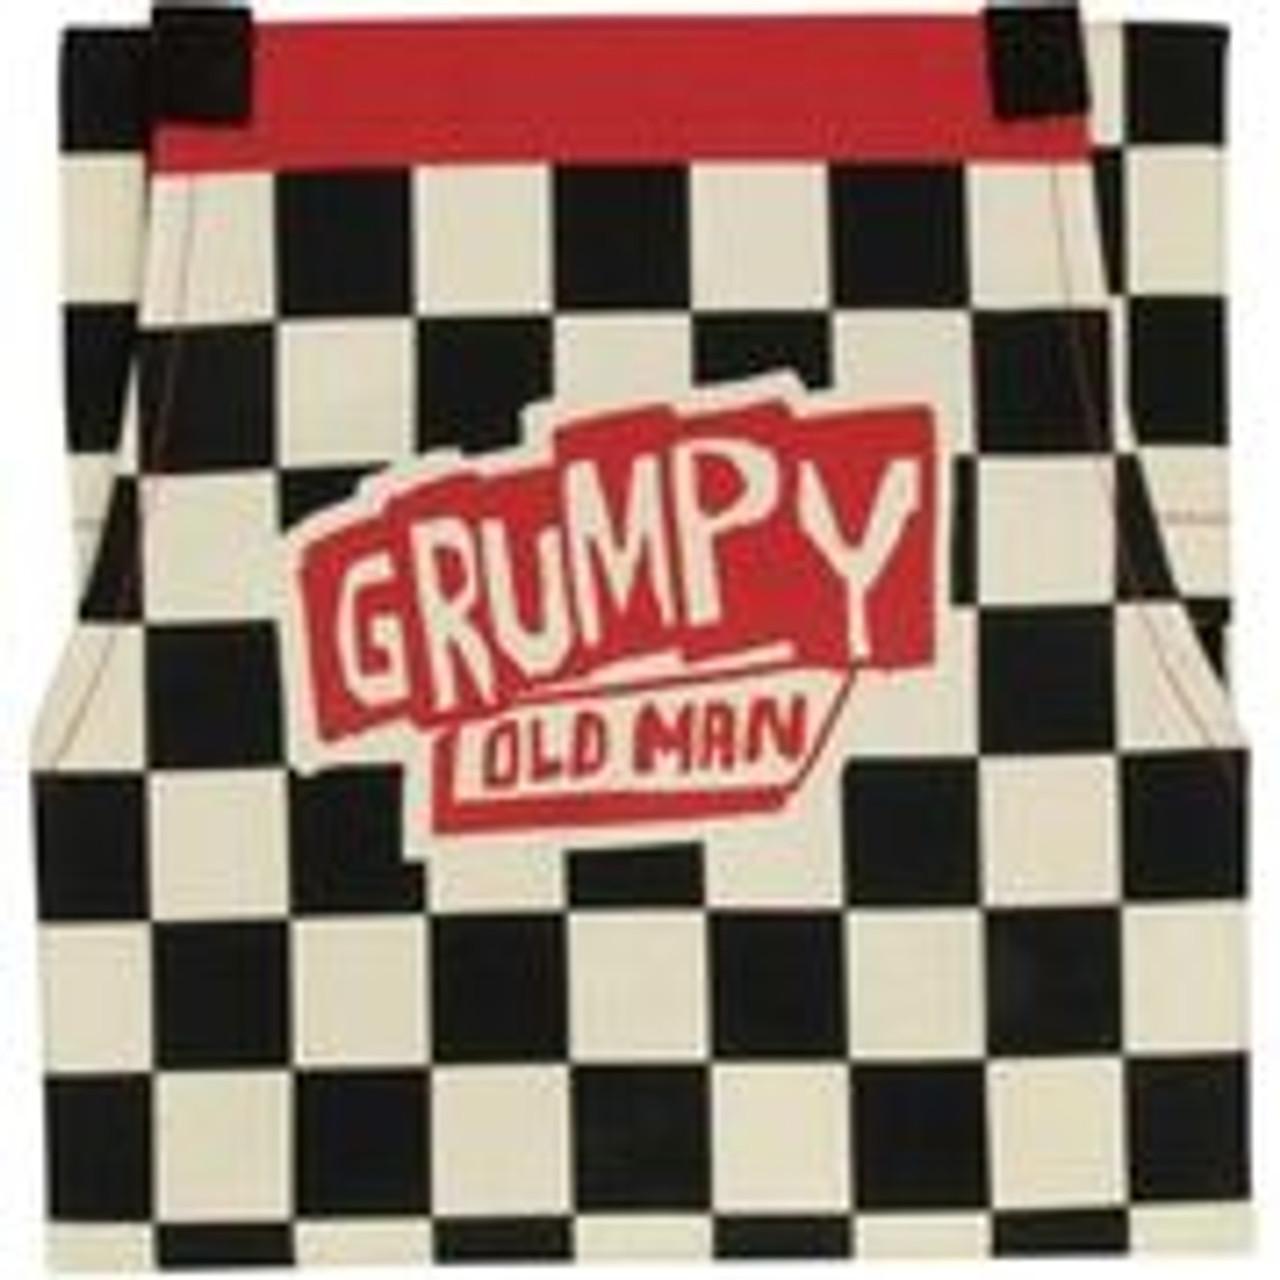 GRUMPY OLD MAN - Apron - BlueQ